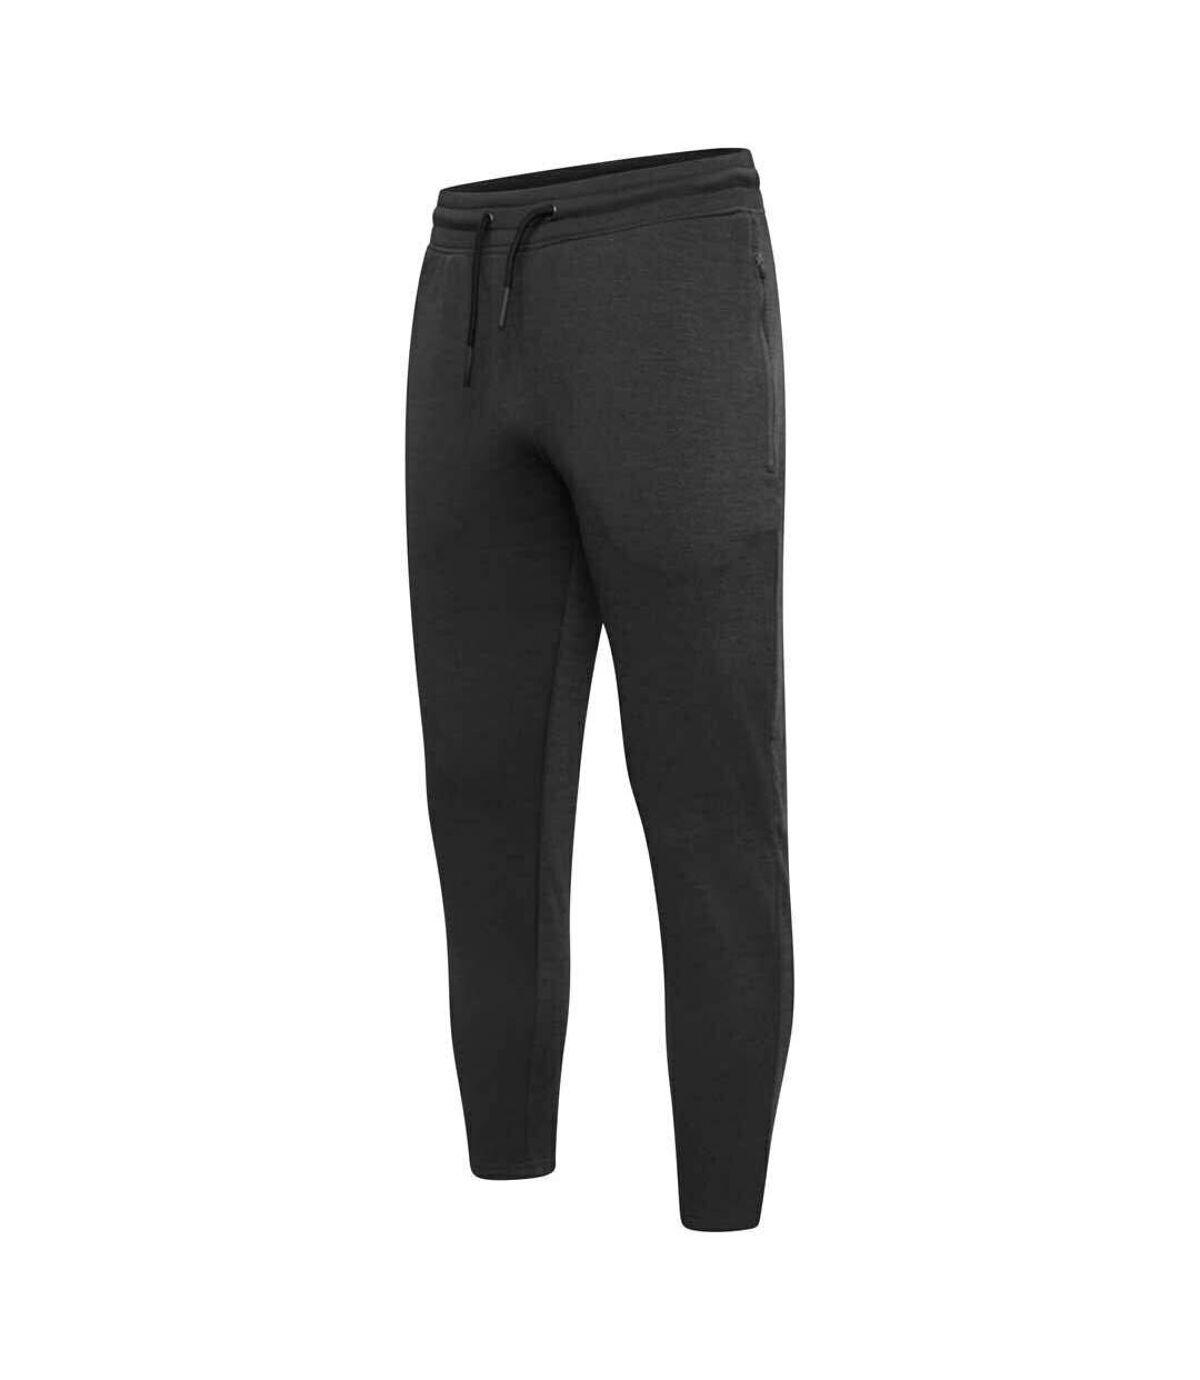 Dare 2B Mens Laze Workout Jogging Bottoms (Charcoal Grey Marl) - UTRG5664